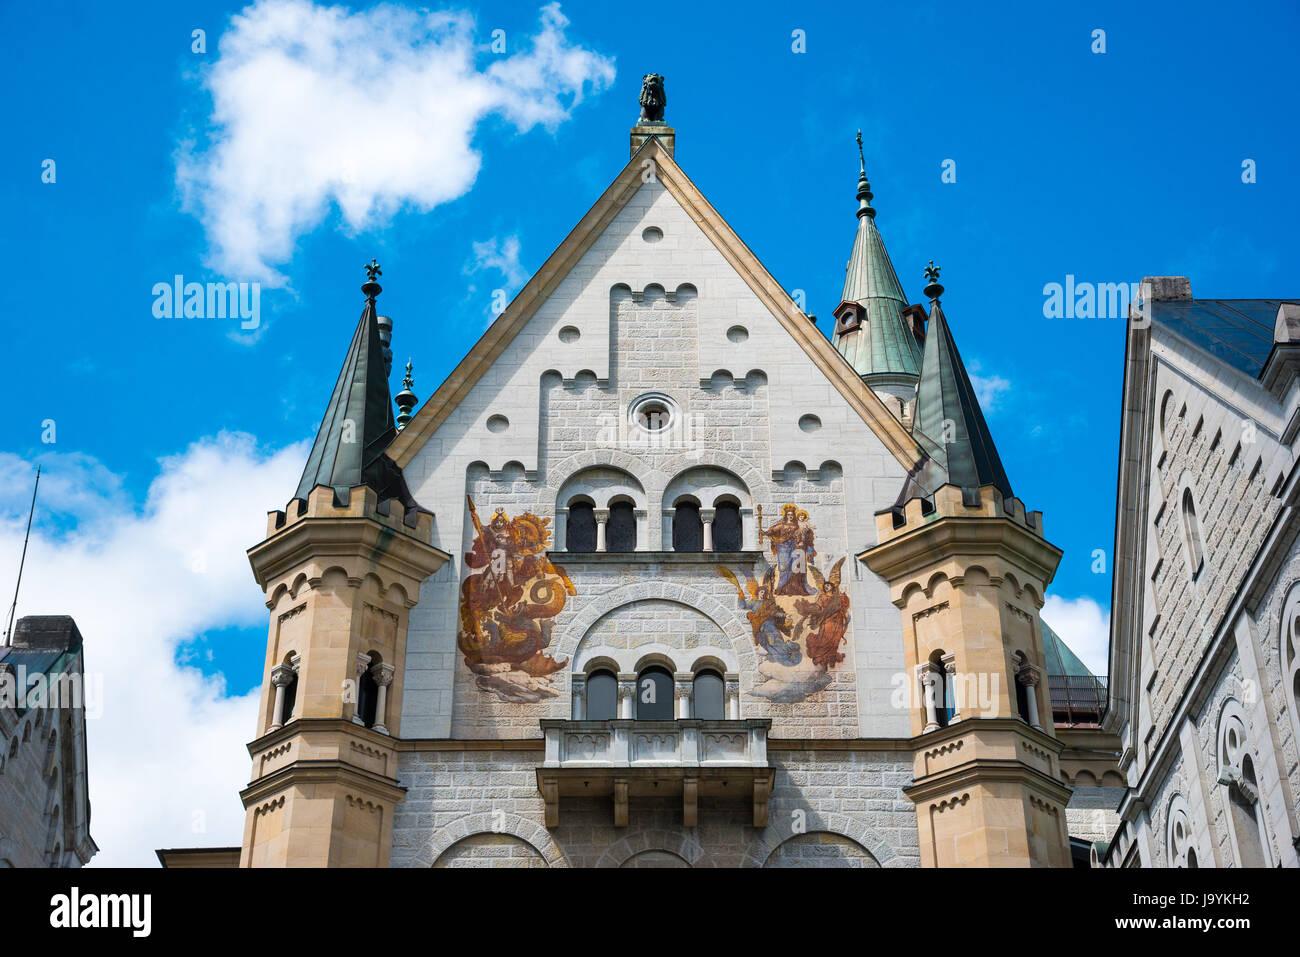 Neuschwanstein Castle. Nineteenth-century Romanesque Revival palace in southwest Bavaria, Germany. - Stock Image